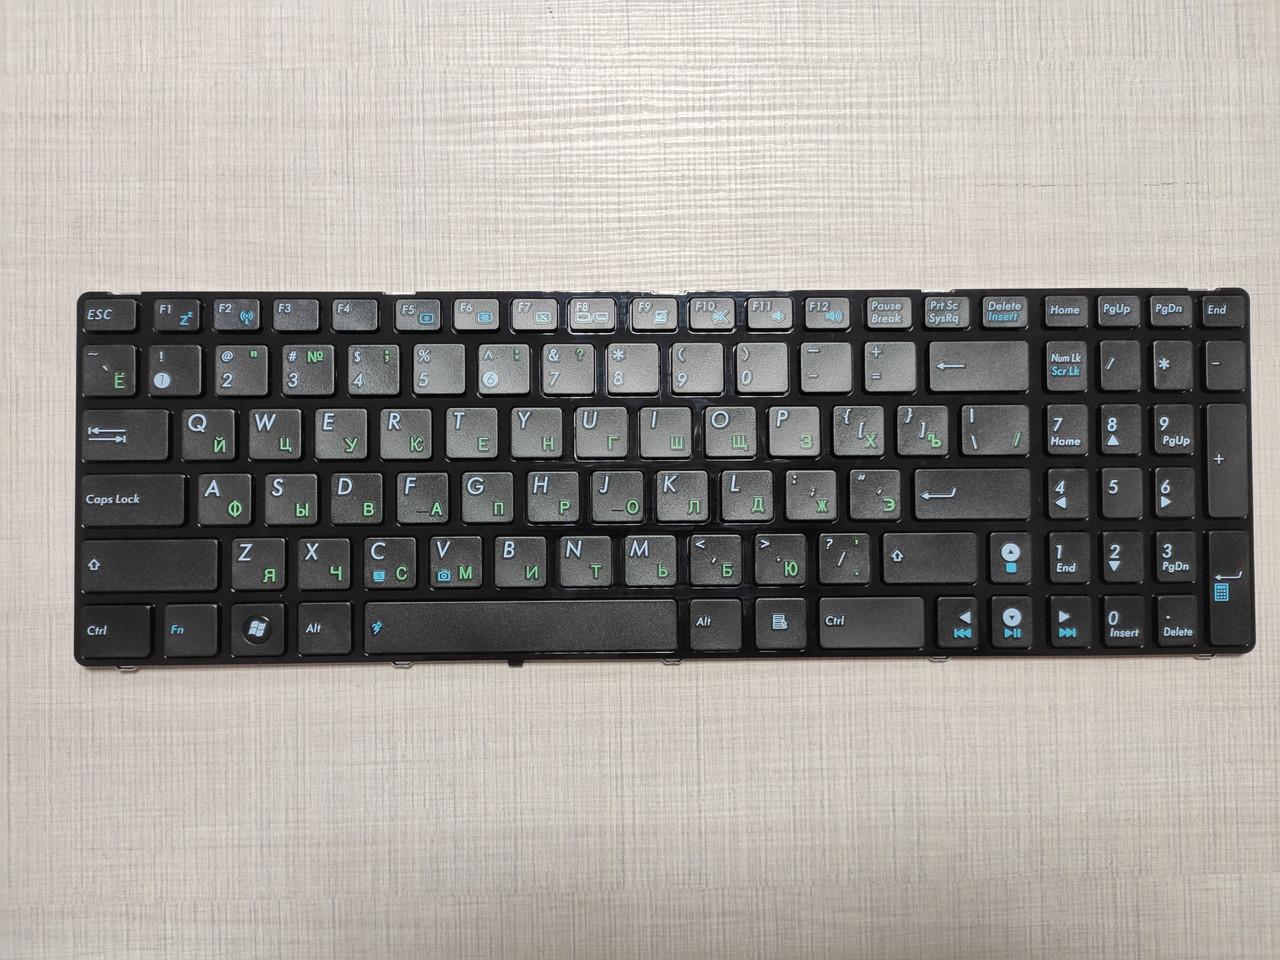 Клавиатура для ноутбука ASUS A52 K52 X54 N53 N61 N73 N90 P53 X54 X55 X61 rus, black K52 ver